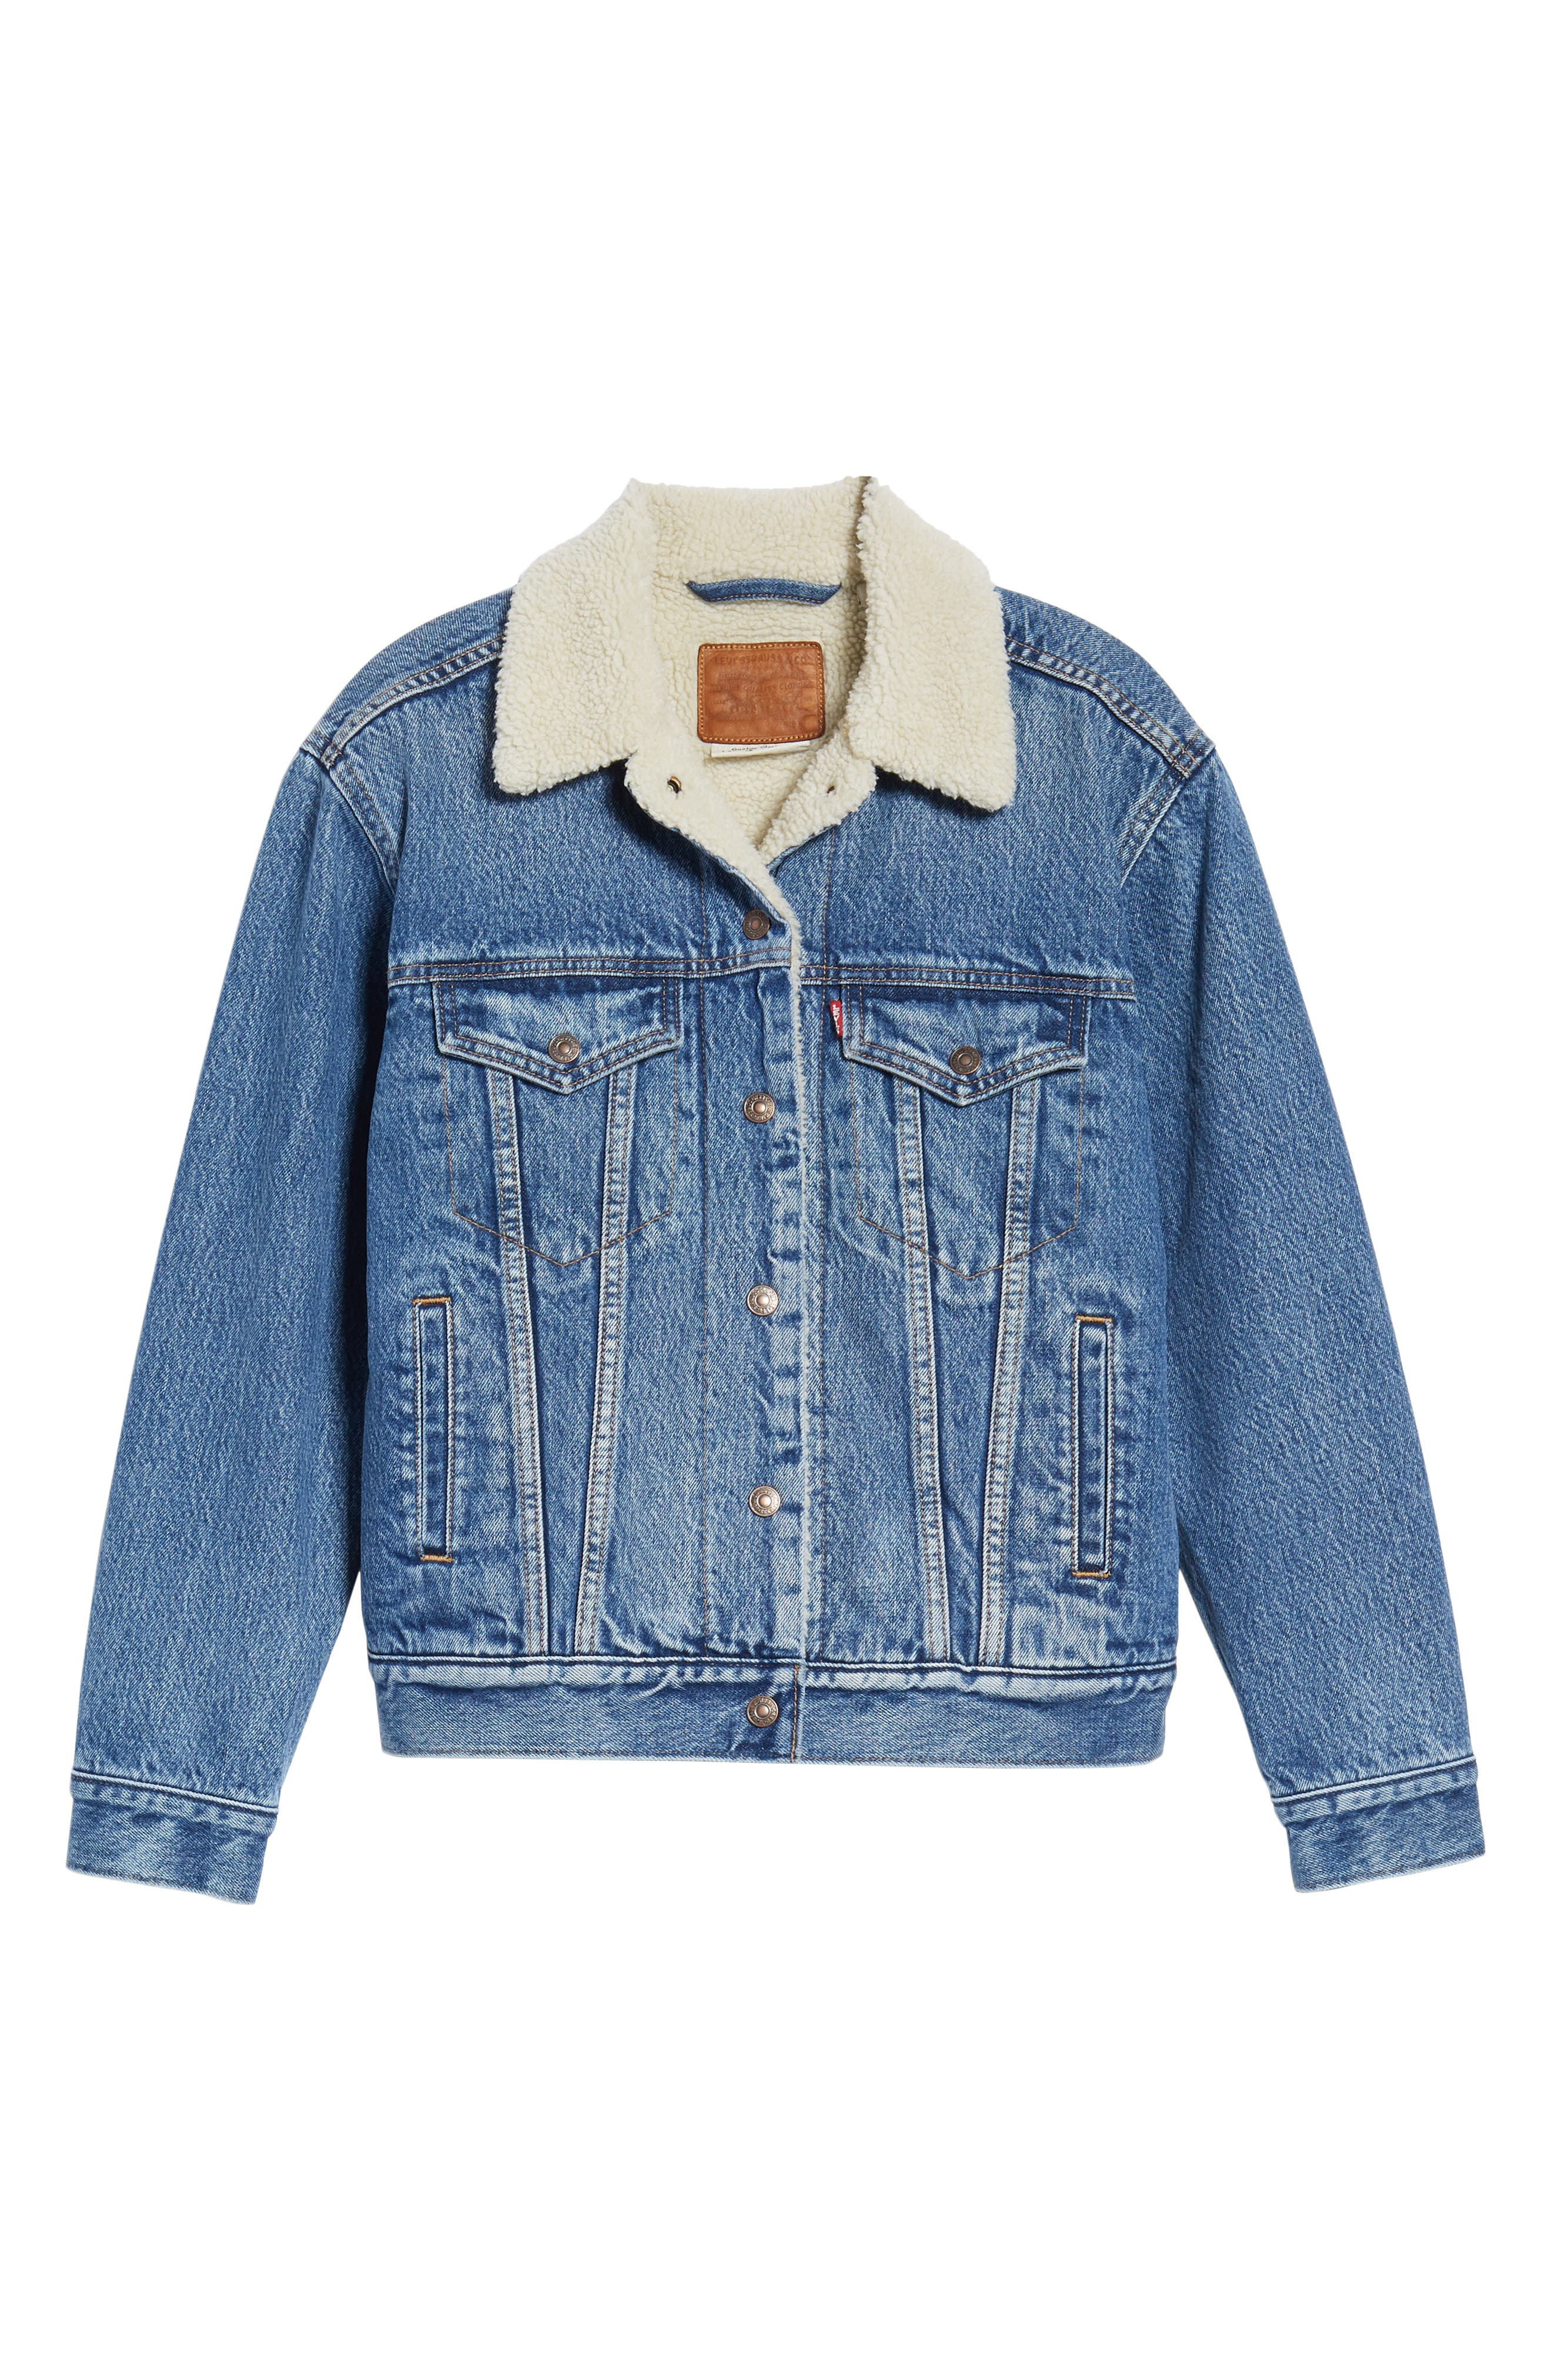 Ex-Boyfriend Fleece Lined Denim Jacket,                             Alternate thumbnail 6, color,                             ADDICTED TO LOVE